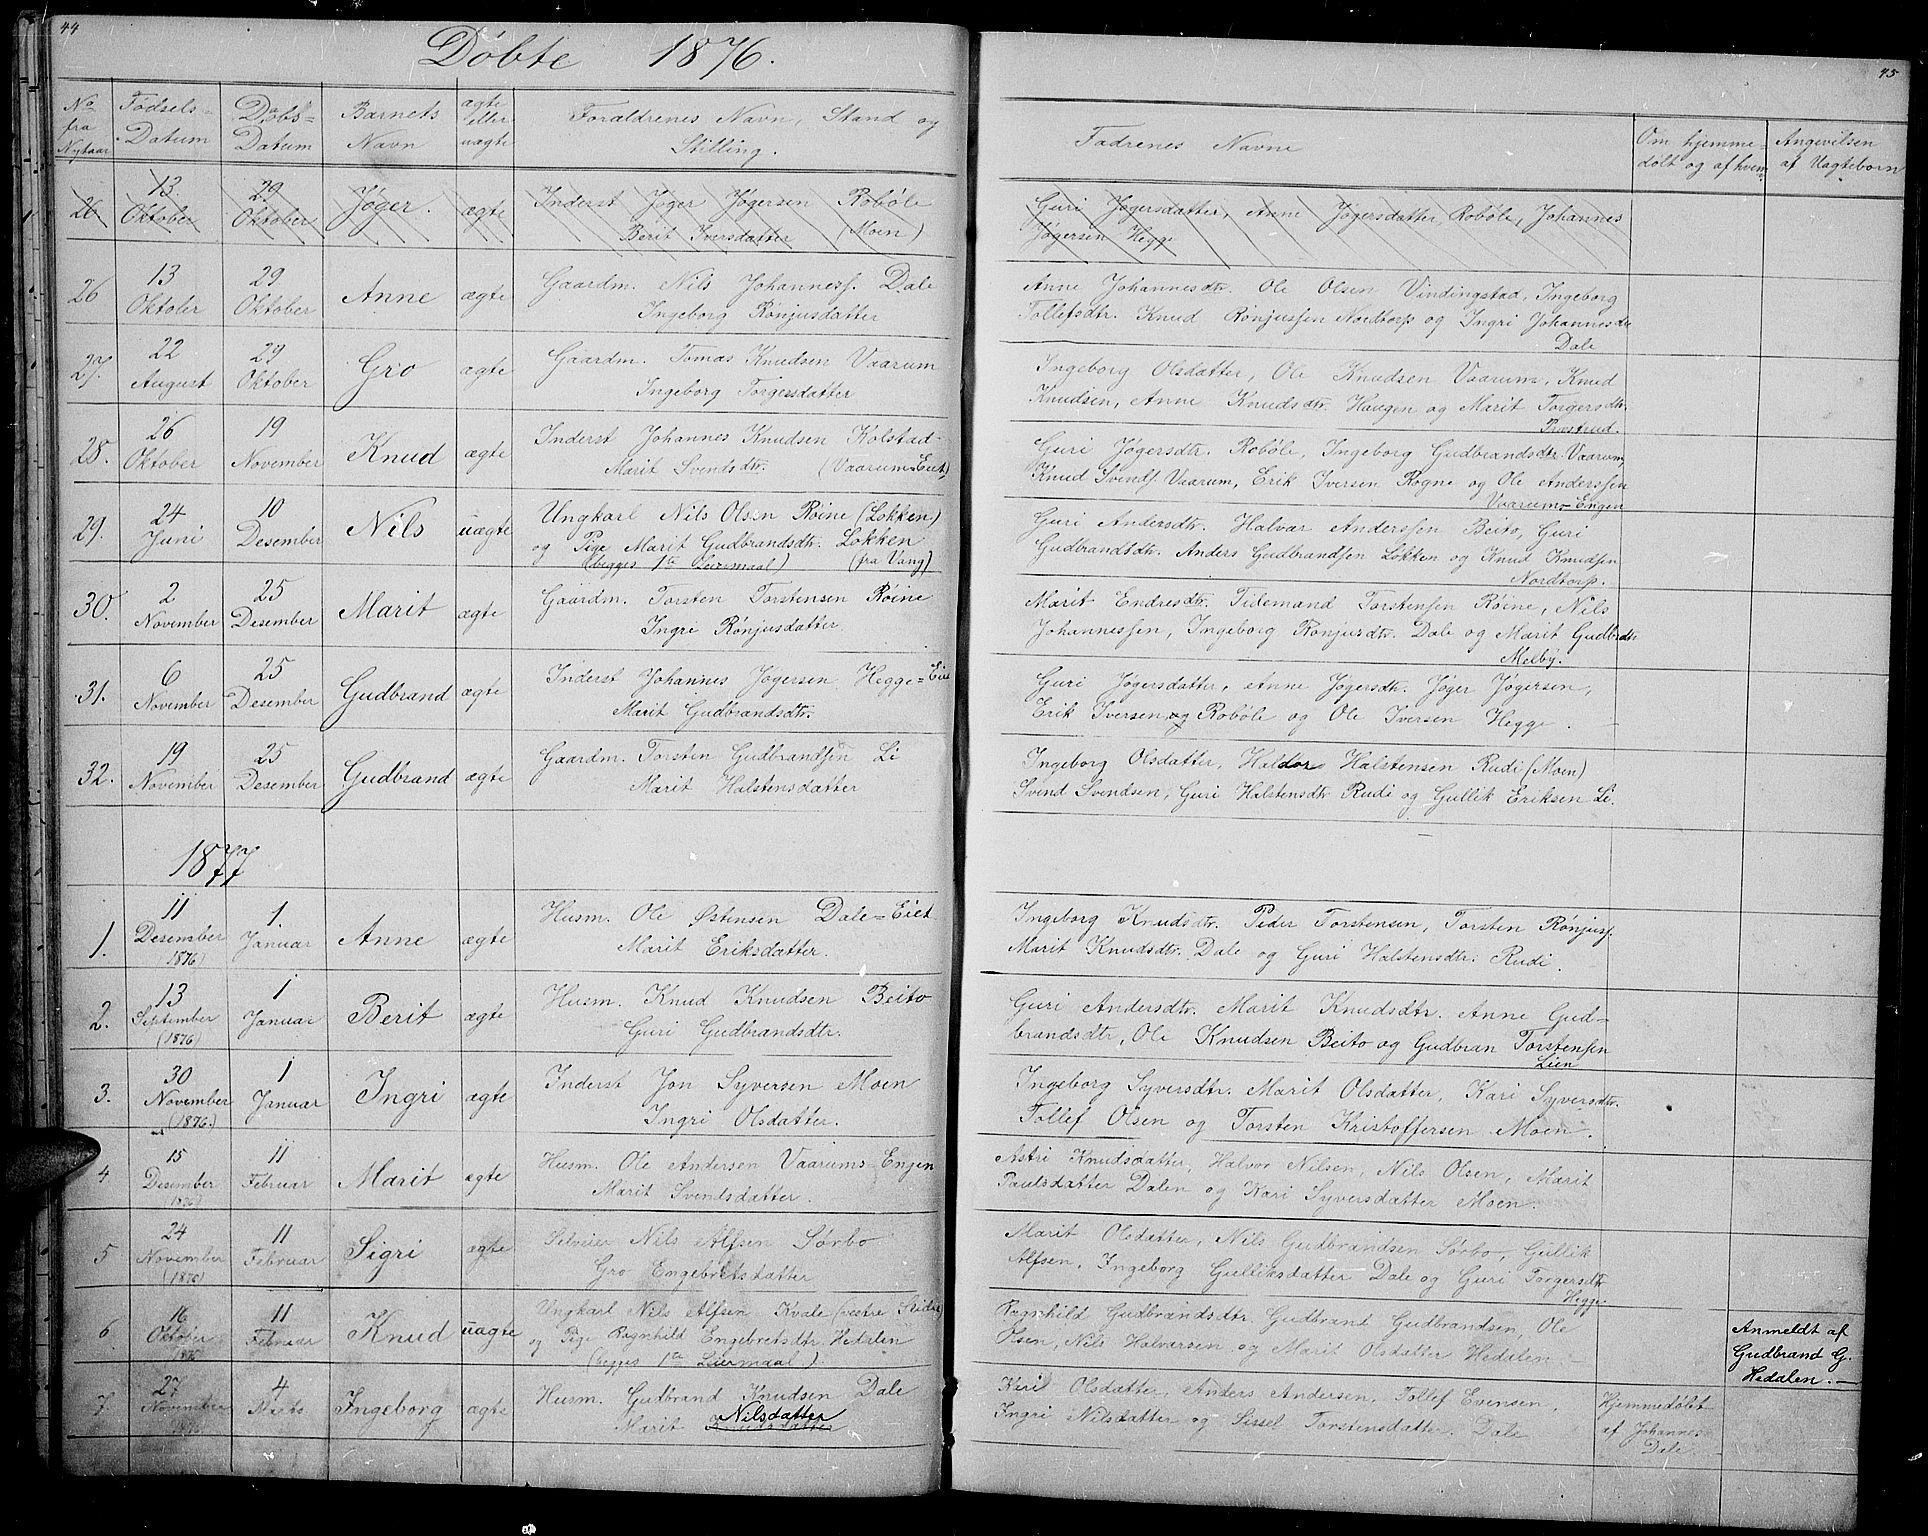 SAH, Øystre Slidre prestekontor, Klokkerbok nr. 1, 1866-1886, s. 44-45